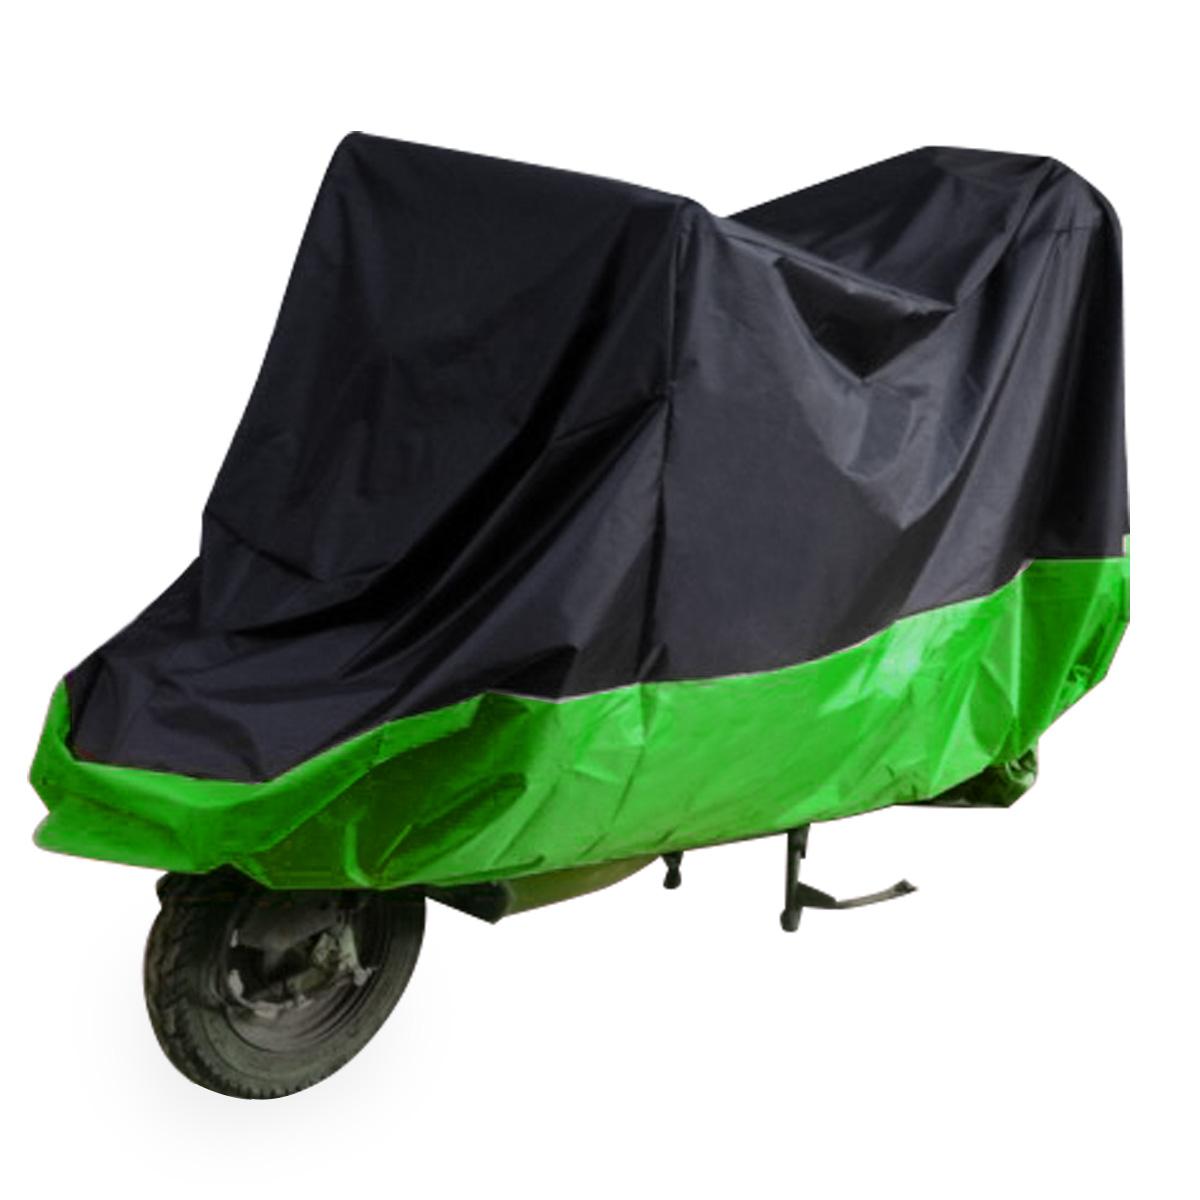 SurePromise Large Motorbike Cover Anti Dust Rain UV Waterproof Motorcycle Protection with Lock Holes Storage Bag